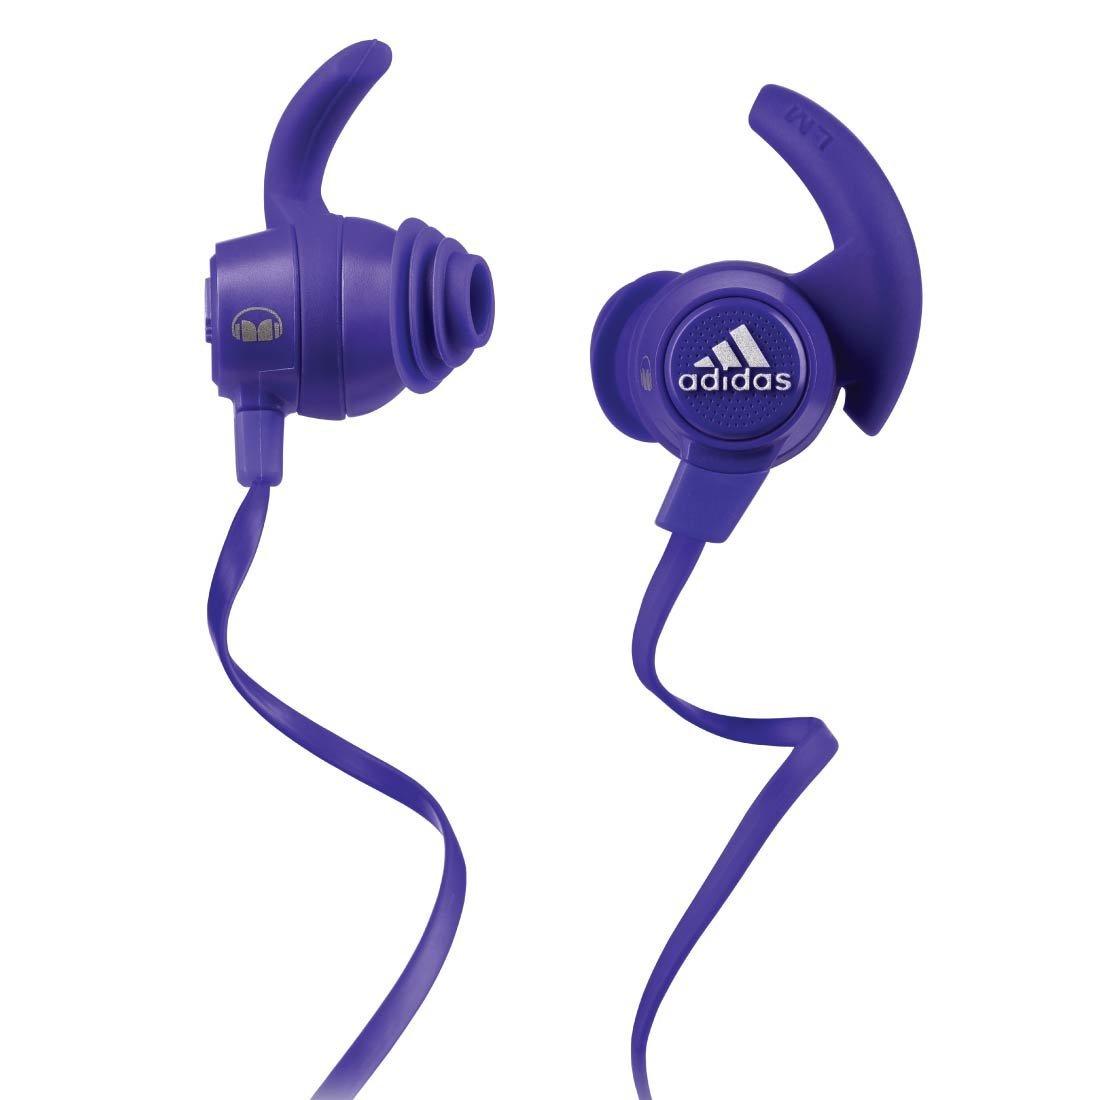 Amazon MX: Audífonos Monster Adidas Response Morado, $312.81